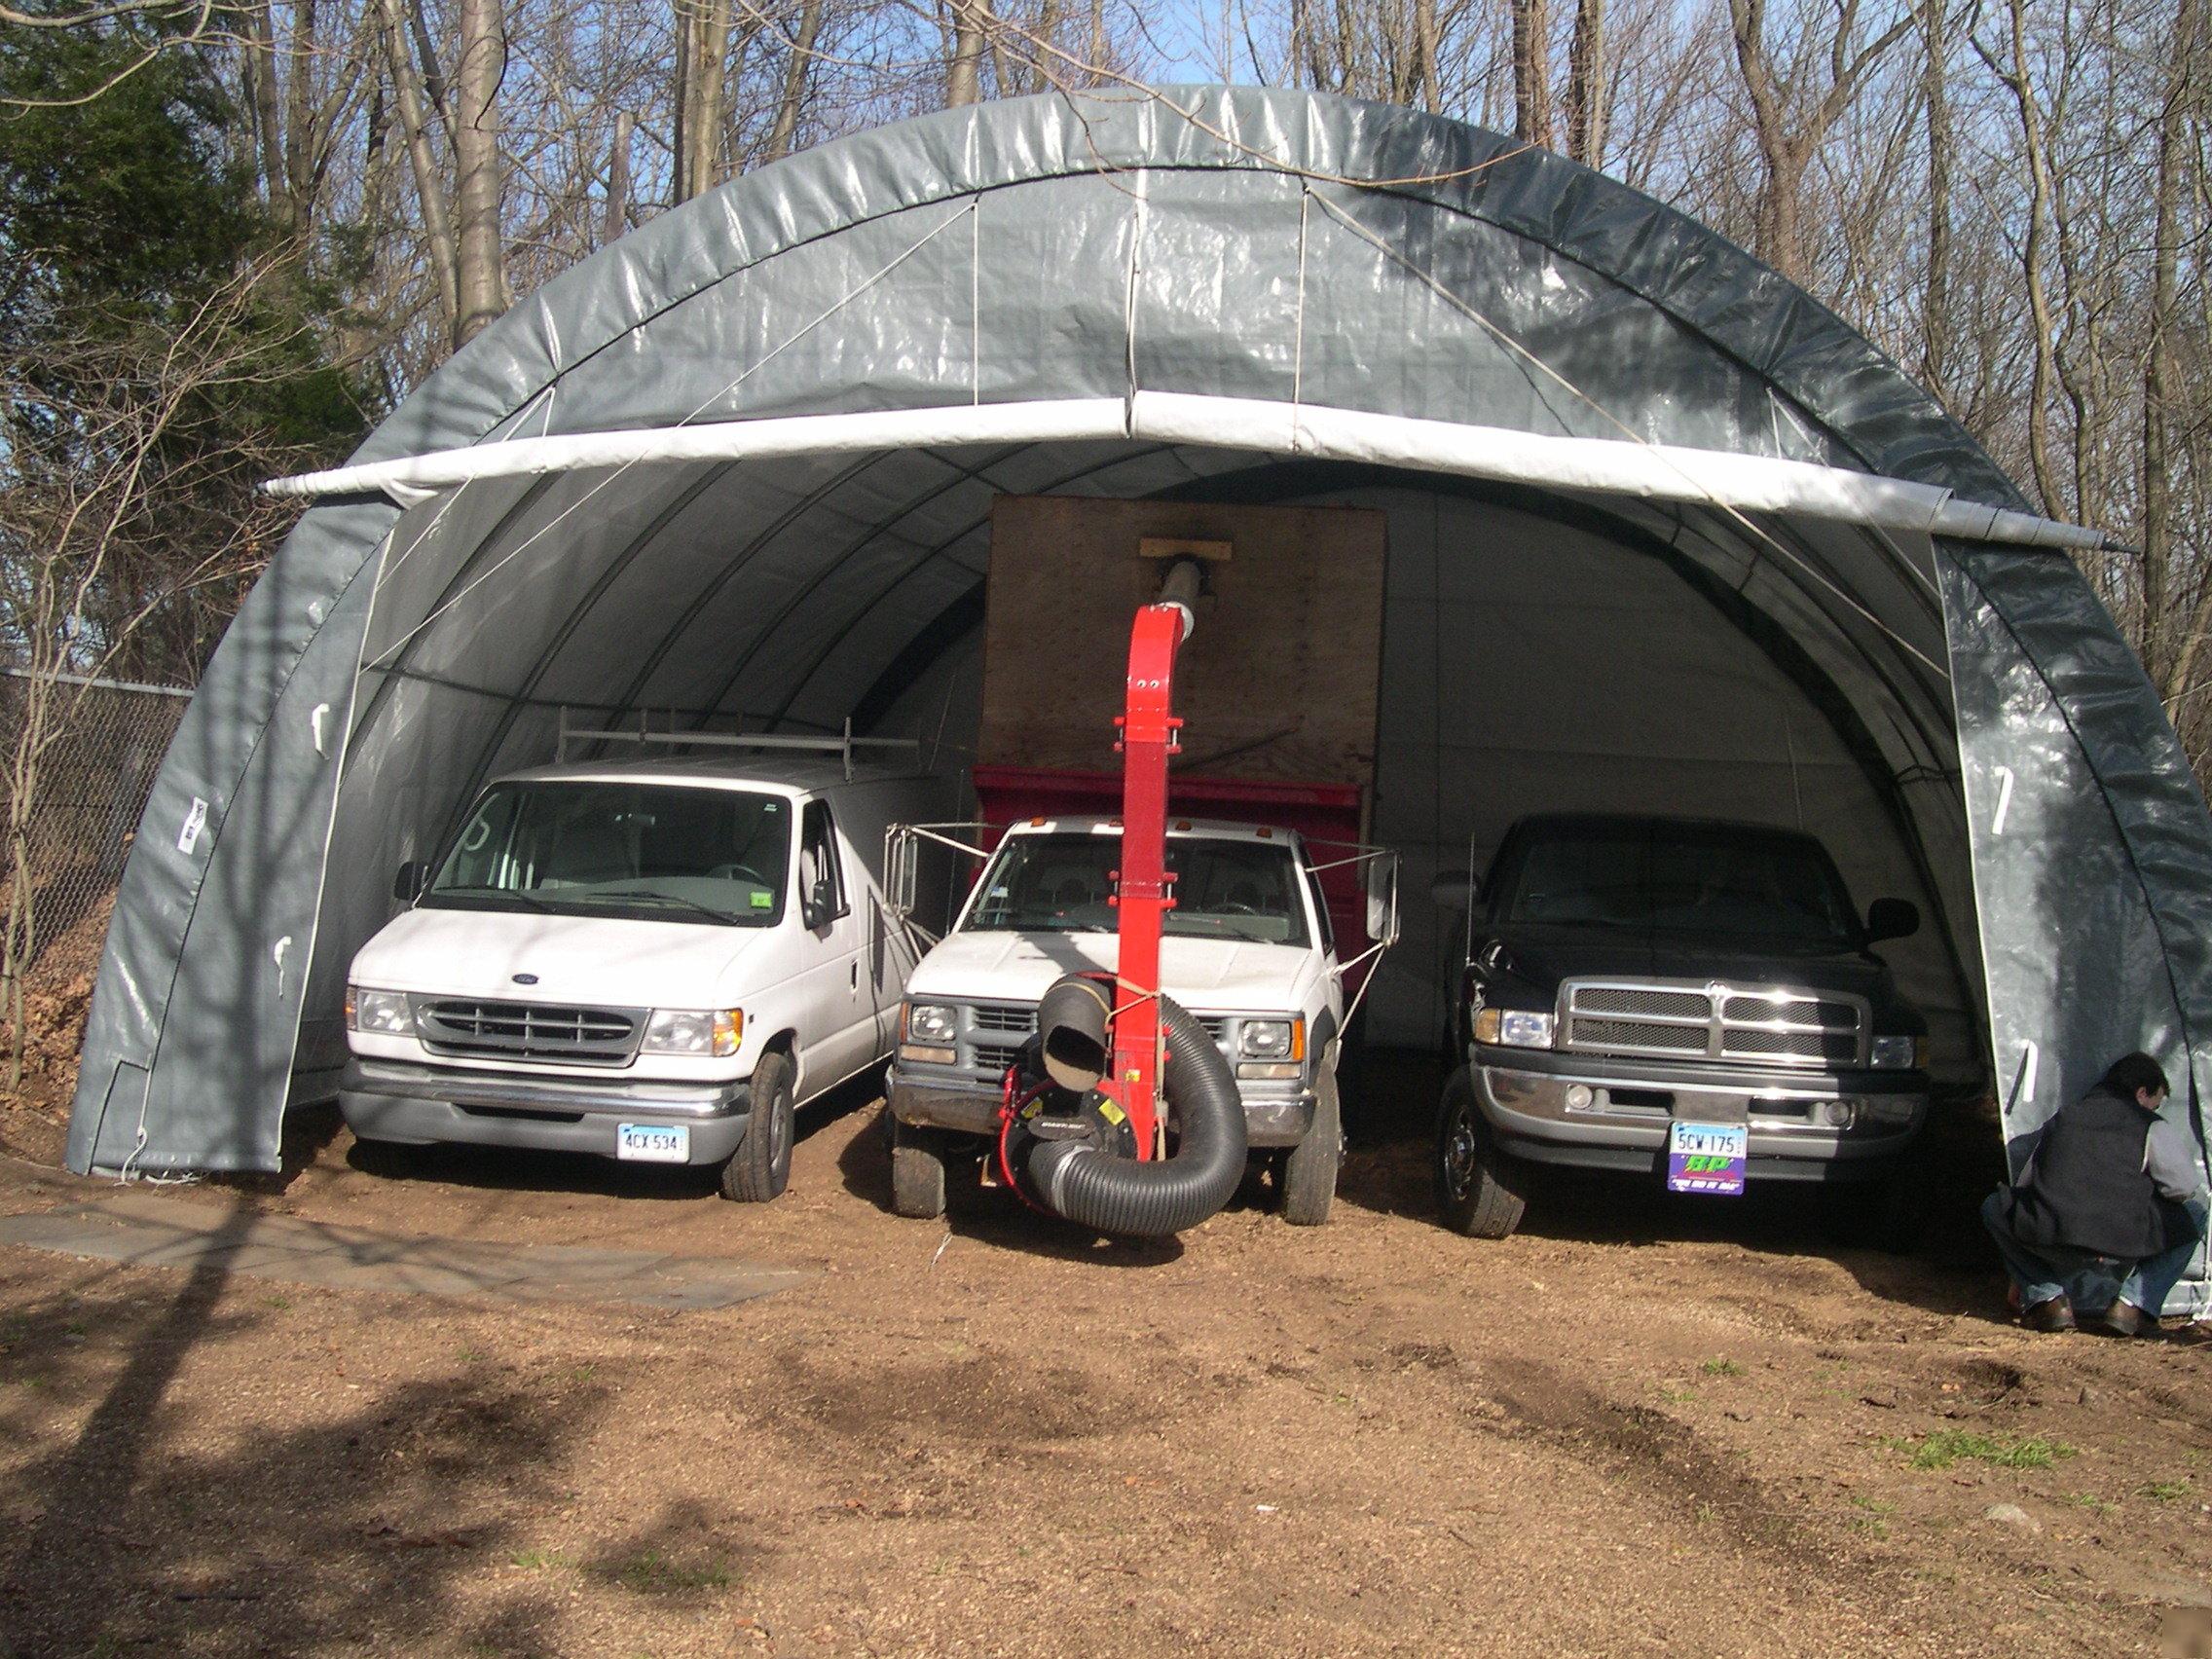 18 By 30 Instant Garage : Portable instant garage shelter carport x